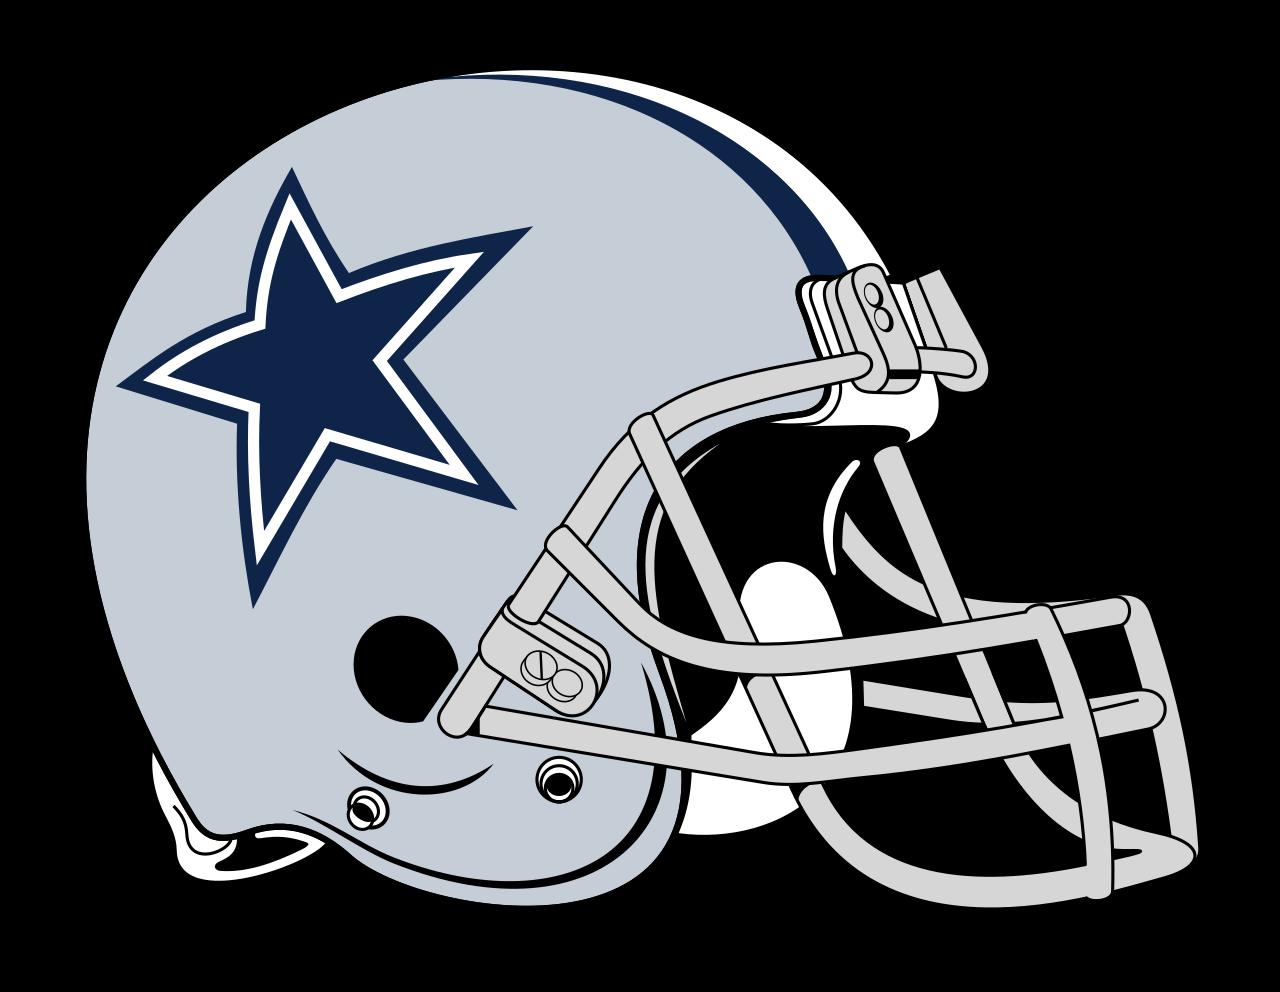 Logo free transparent png. Dallas cowboys clipart official